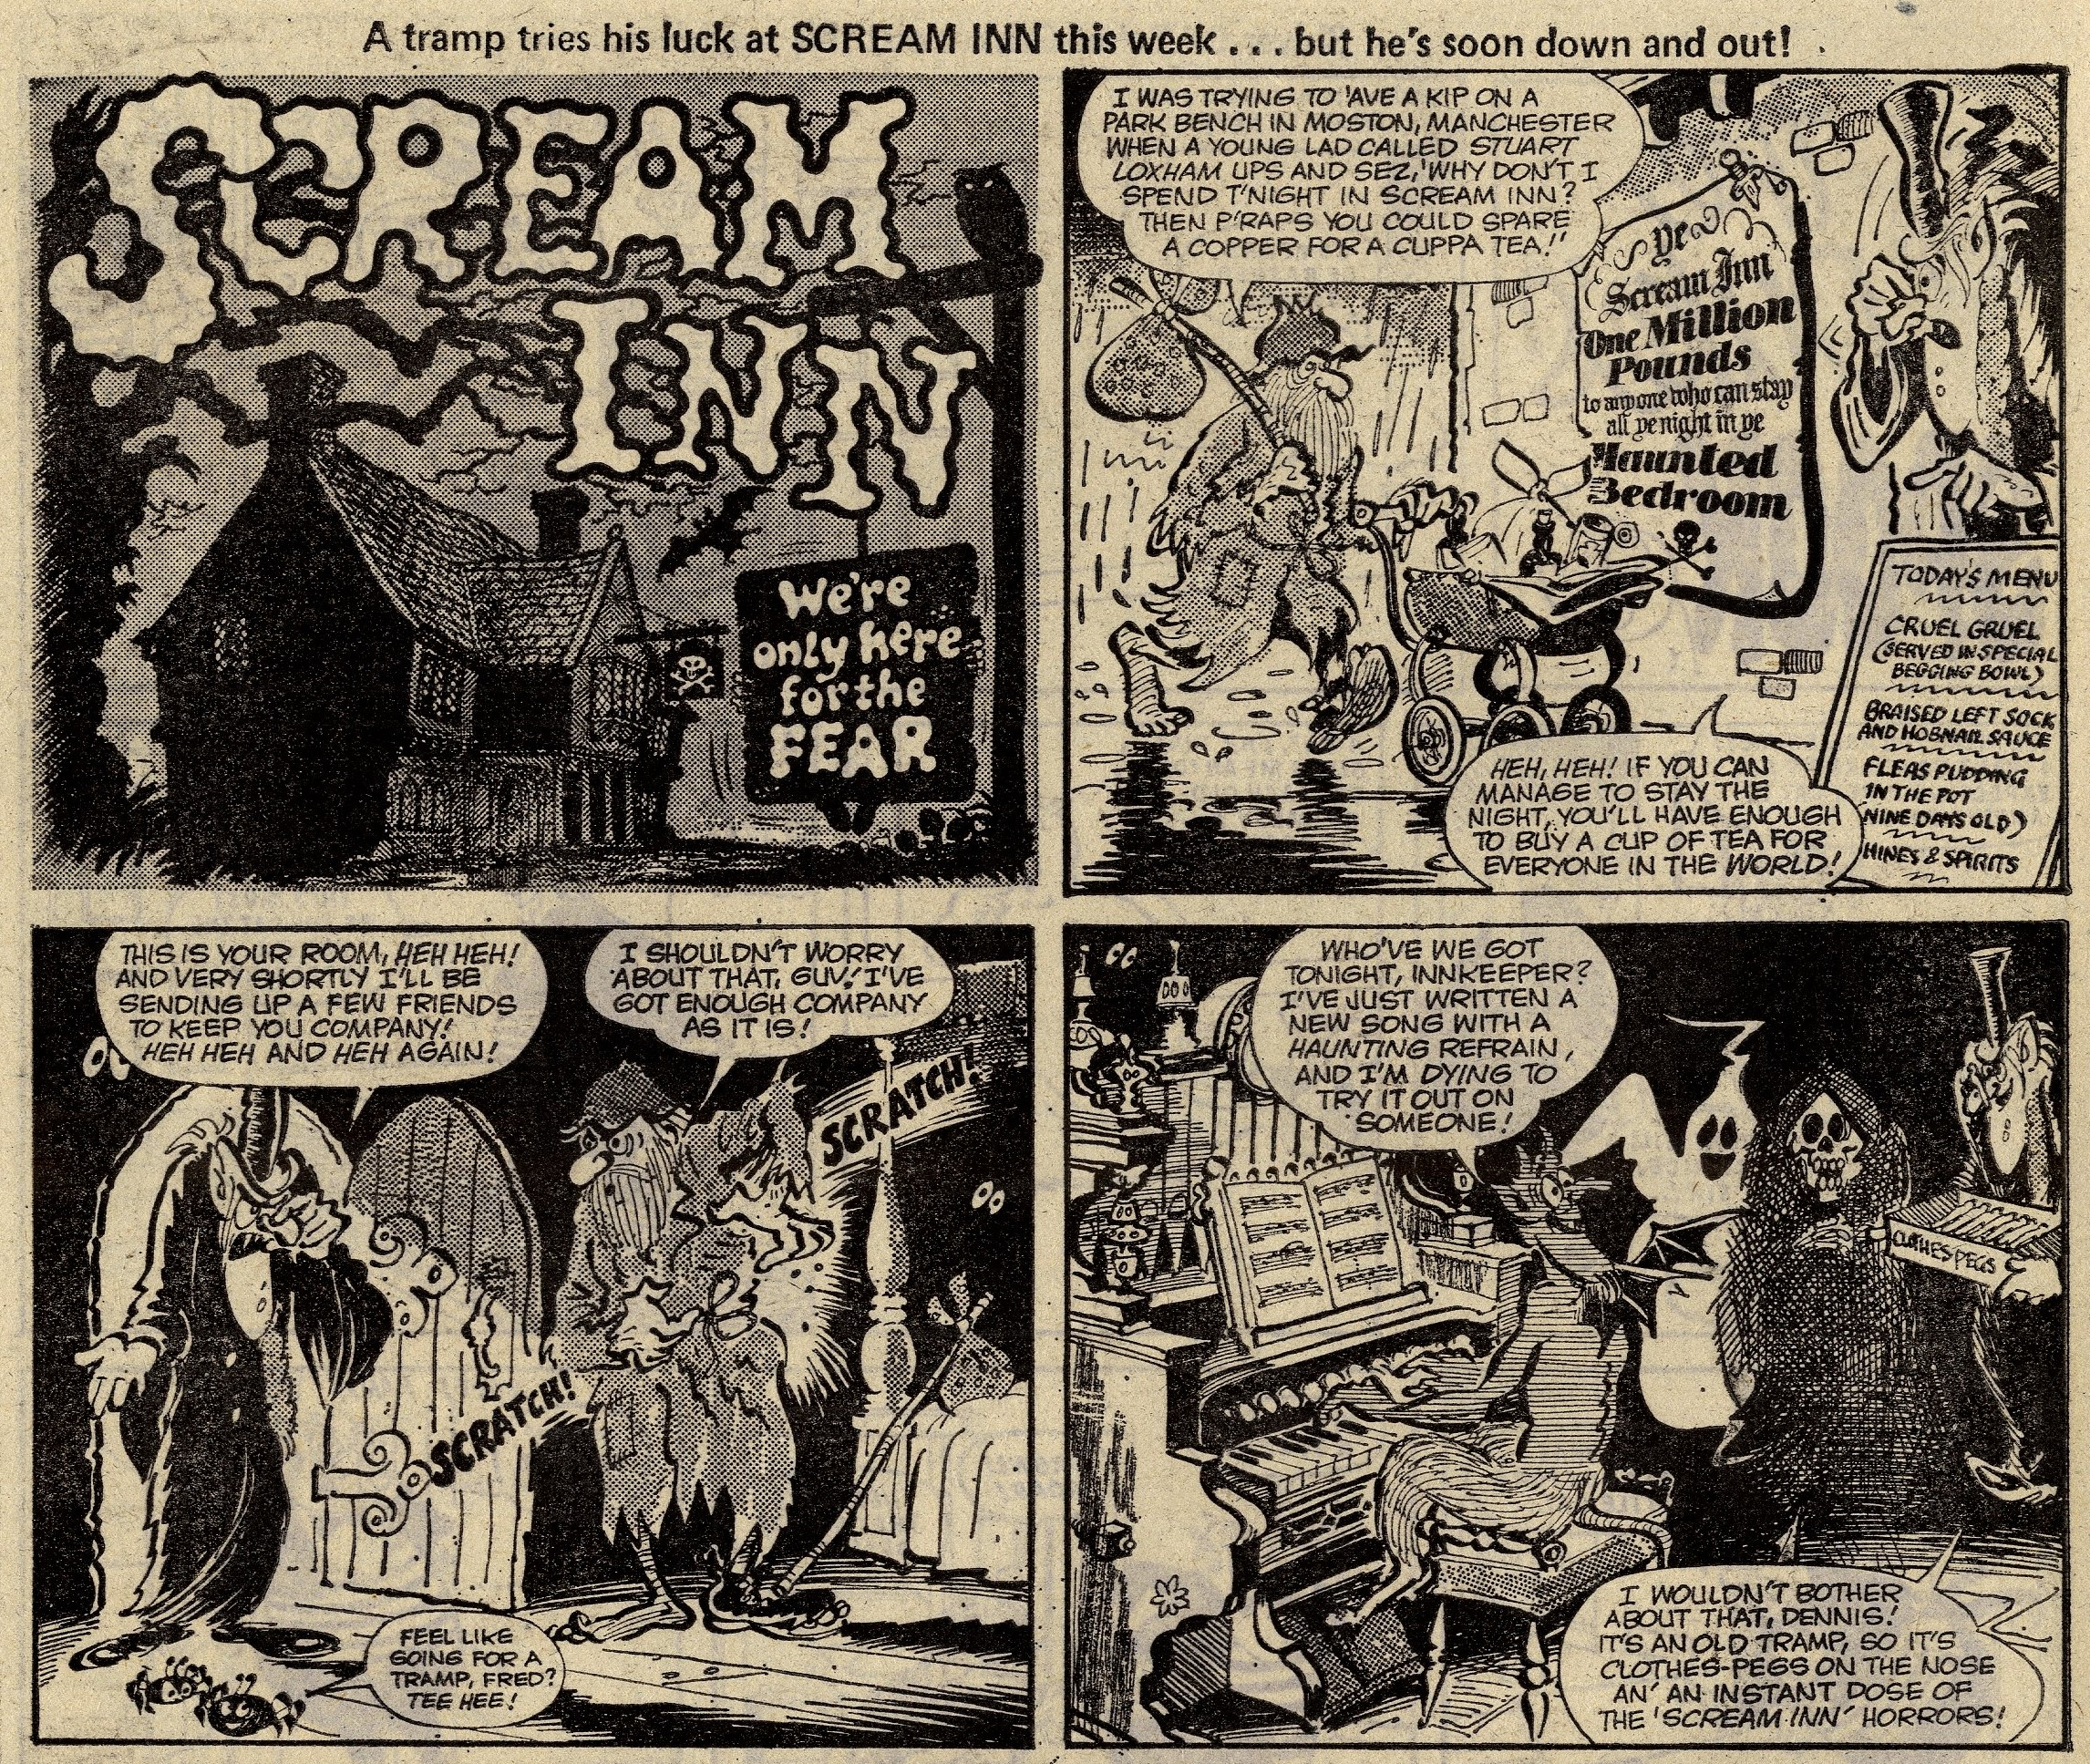 Scream Inn: Brian Walker (artist)